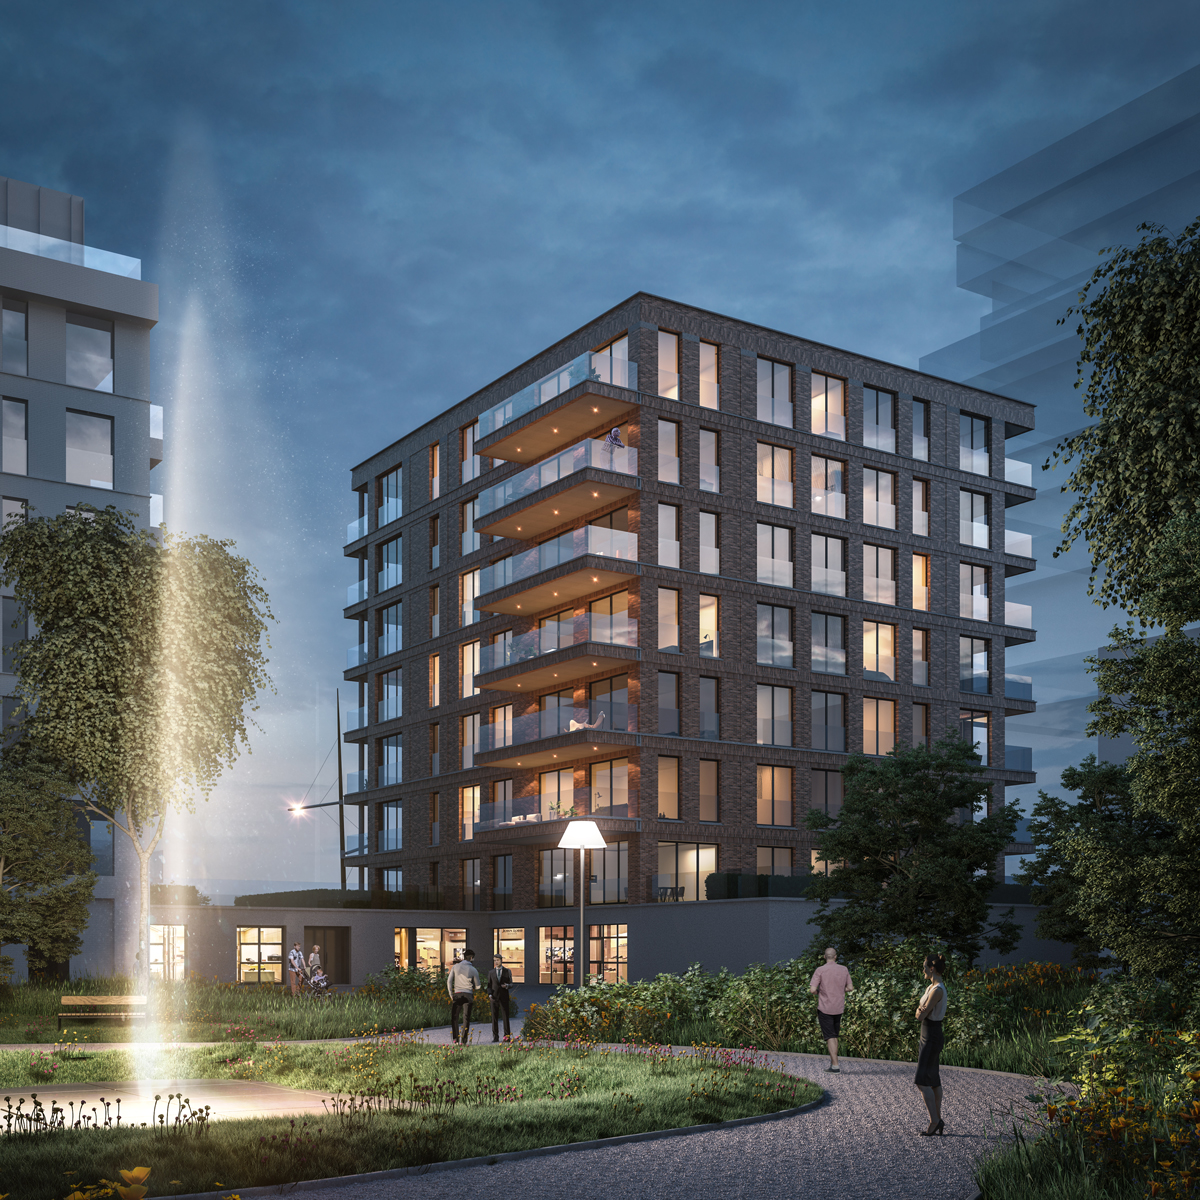 Nieuwbouw appartementen Oostende Baelskaai met prachtig avondlicht